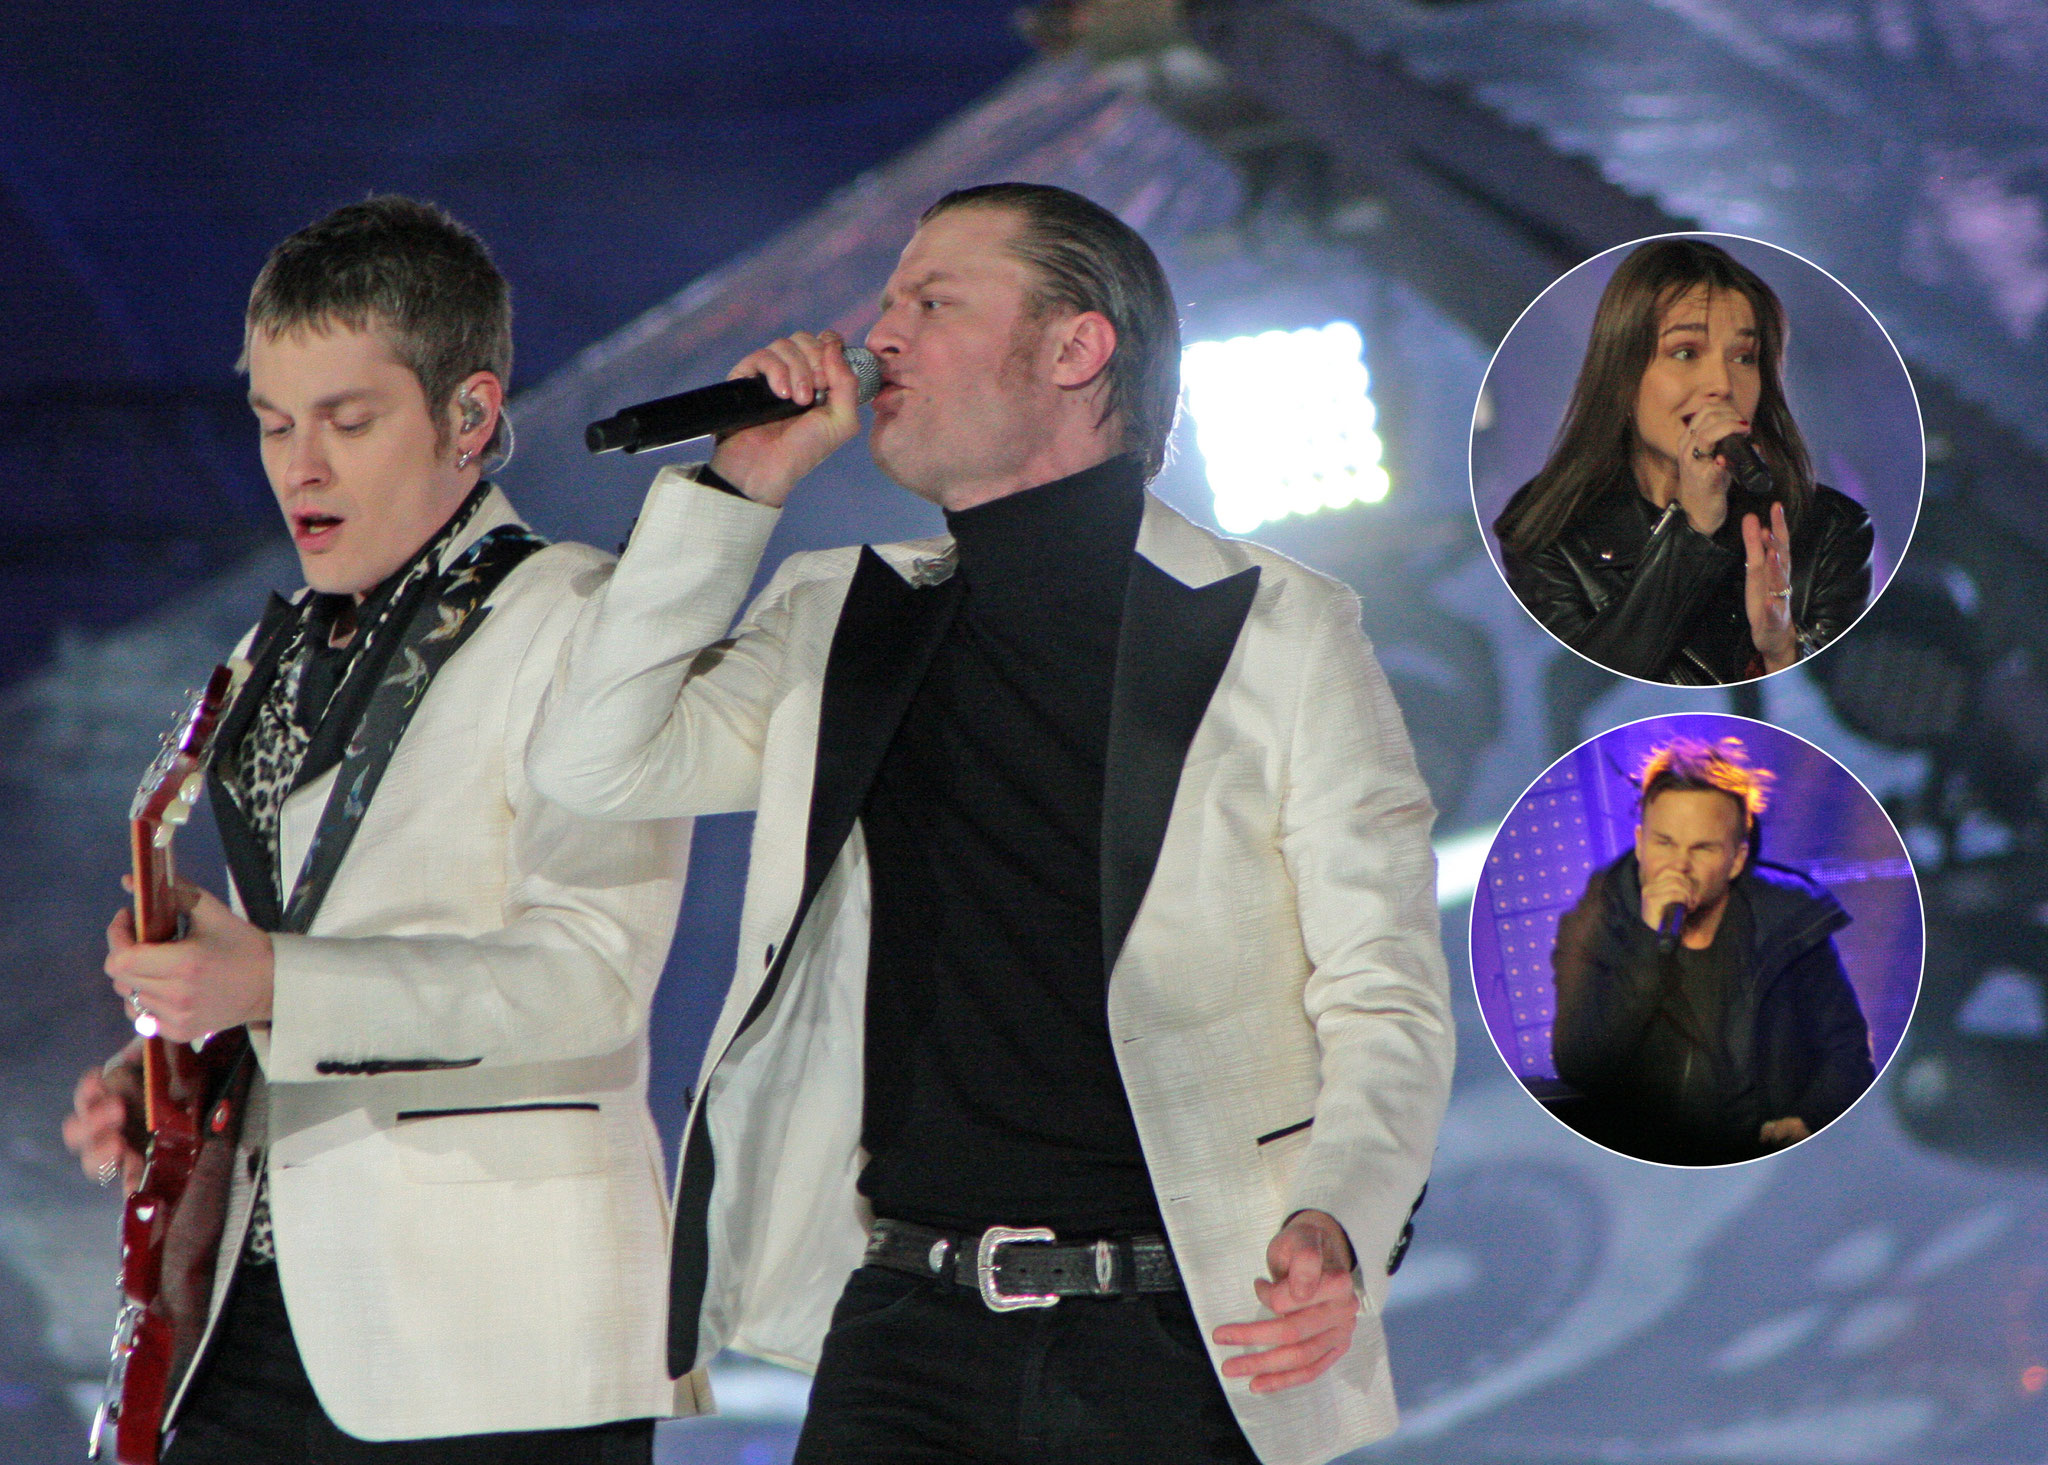 Mando Diao, The Rasmus, Lotte: So feierte Berlin 2020! (c) miggl.at